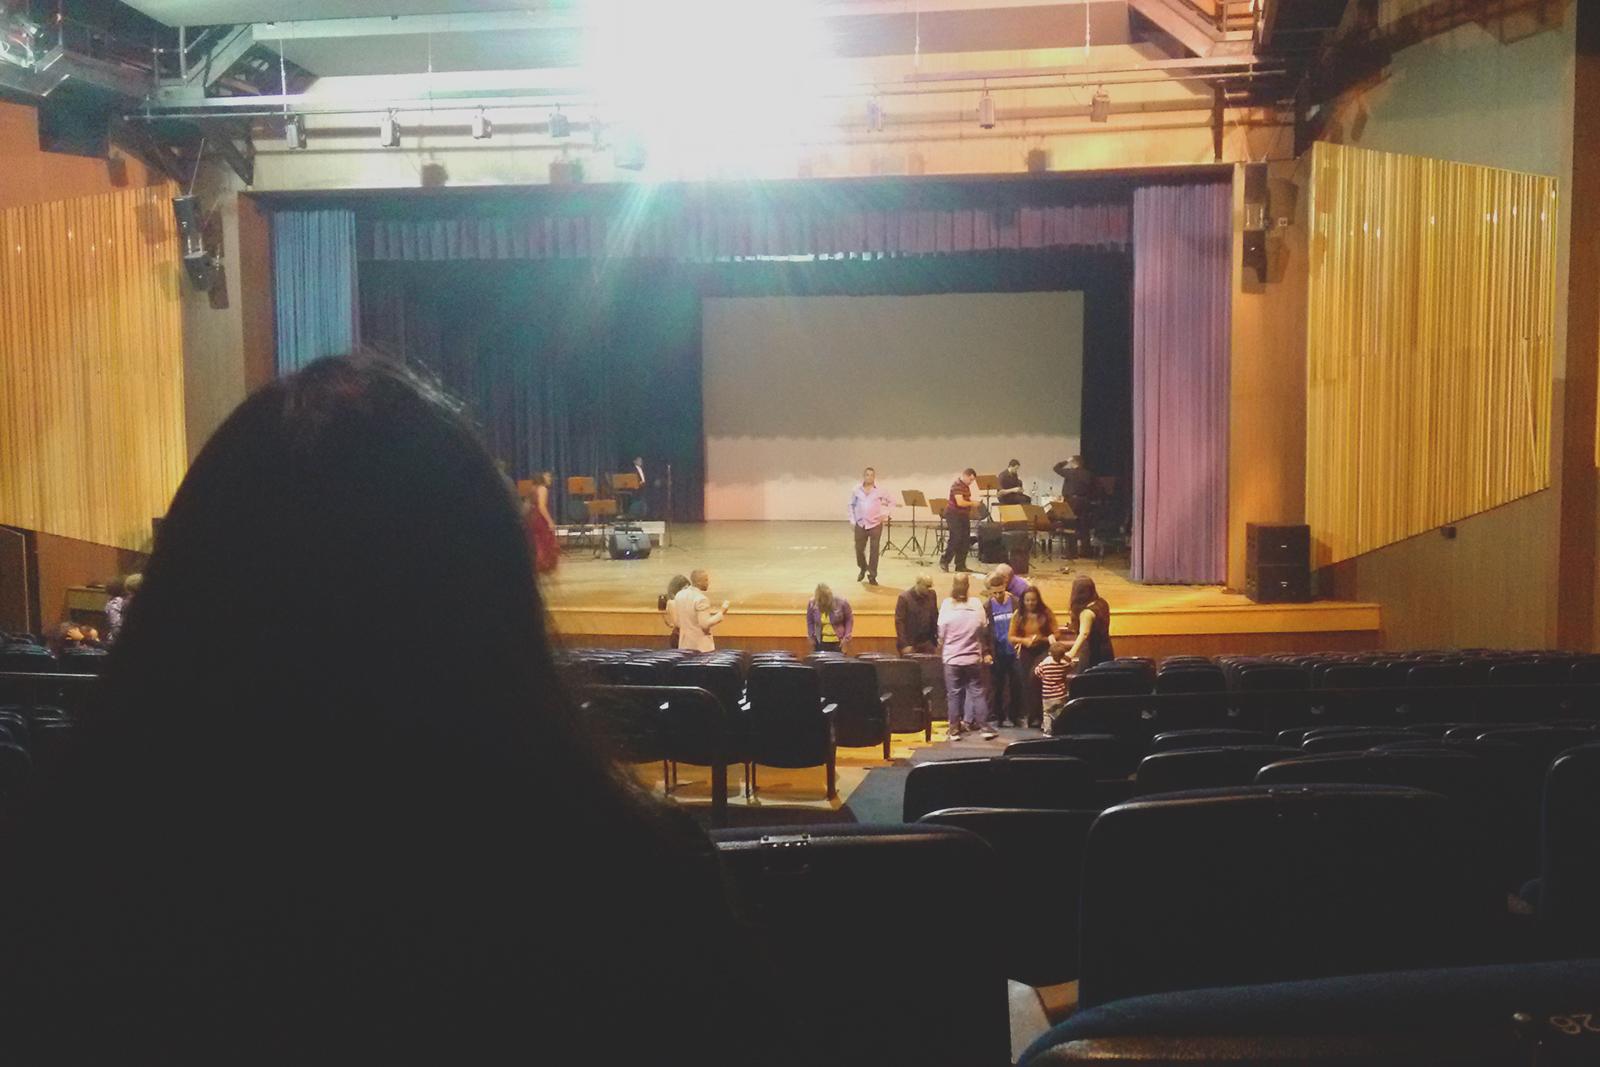 vista público teatro castro mendes